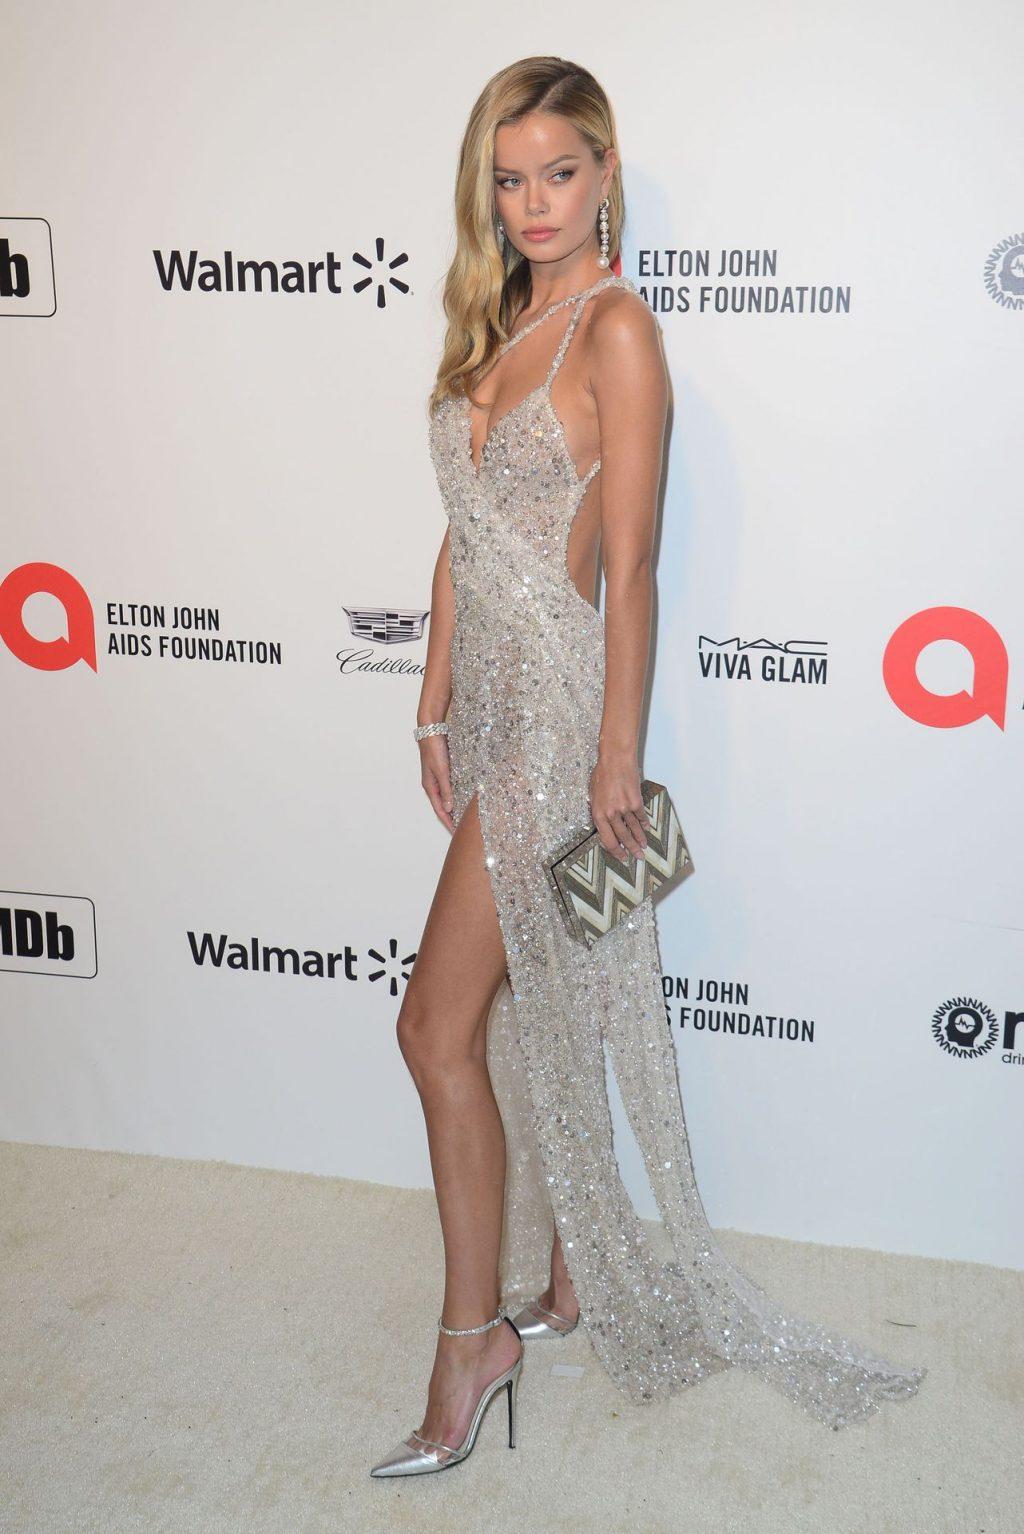 Frida Aasen Shows Her Slim Body at the Elton John AIDS Foundation Oscars Party (26 Photos)